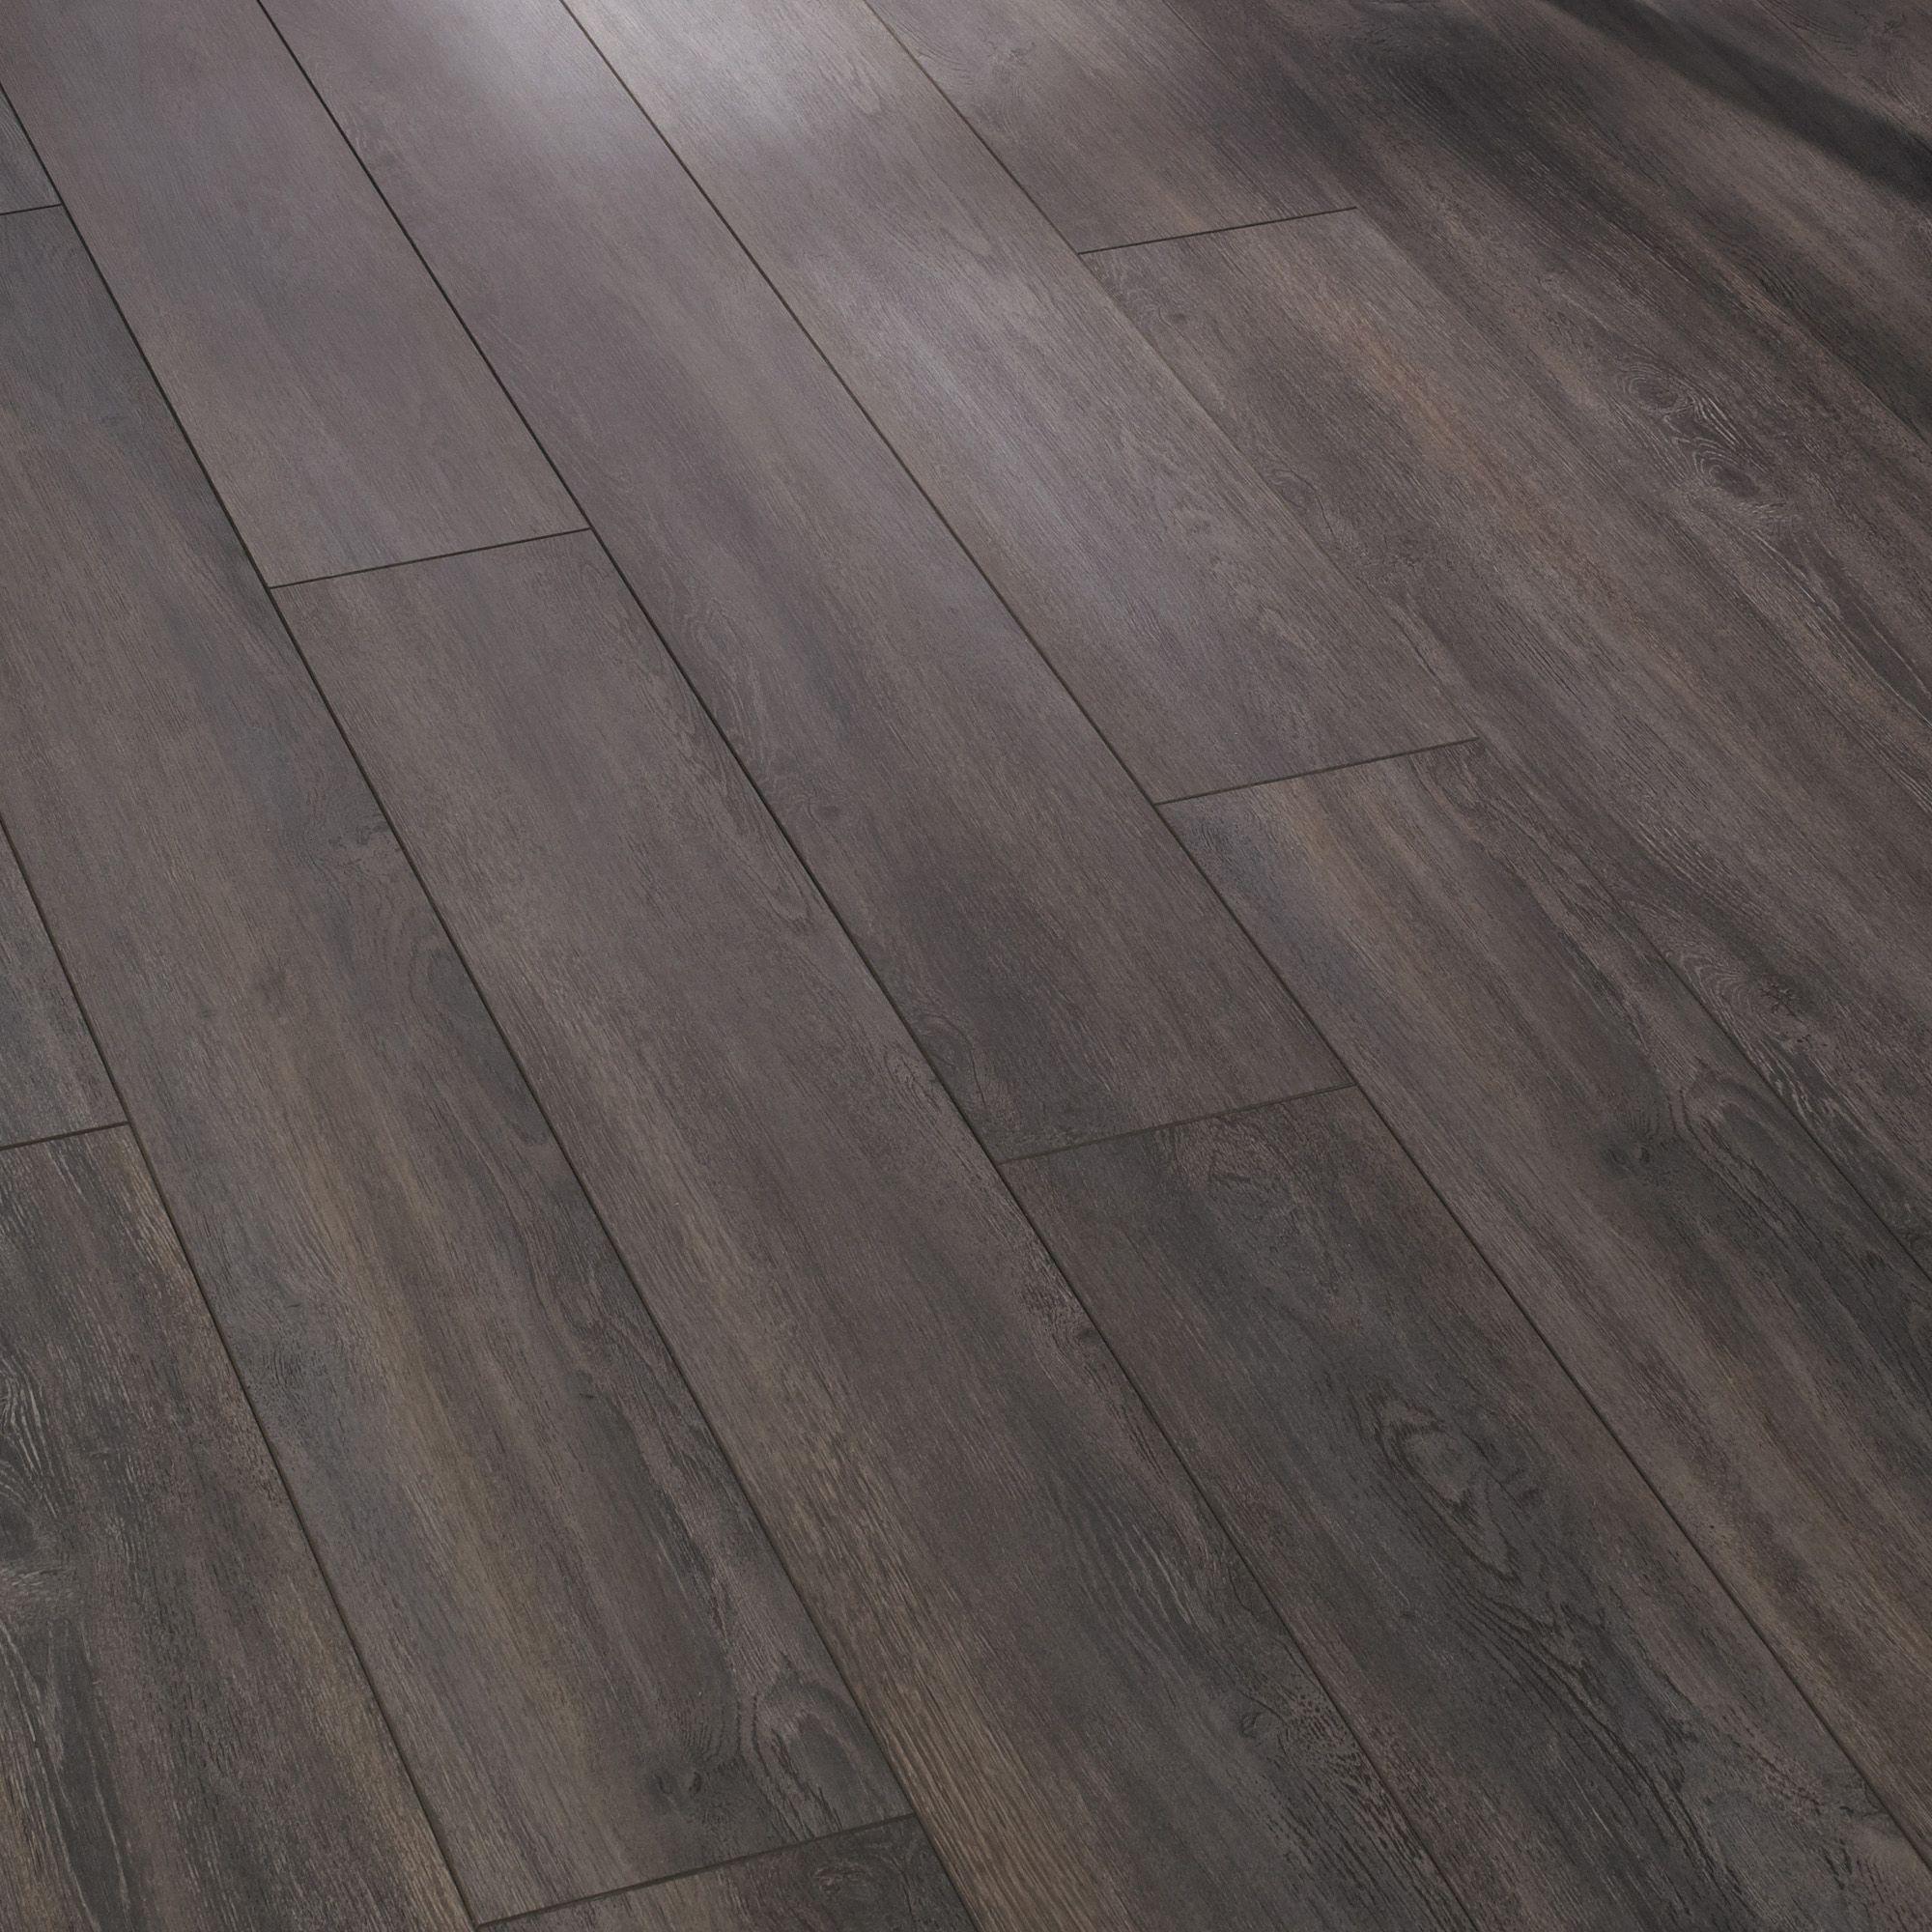 Bq Kitchen Laminate Flooring Leggiero Cream Travertine Tile Effect Laminate Flooring Sample